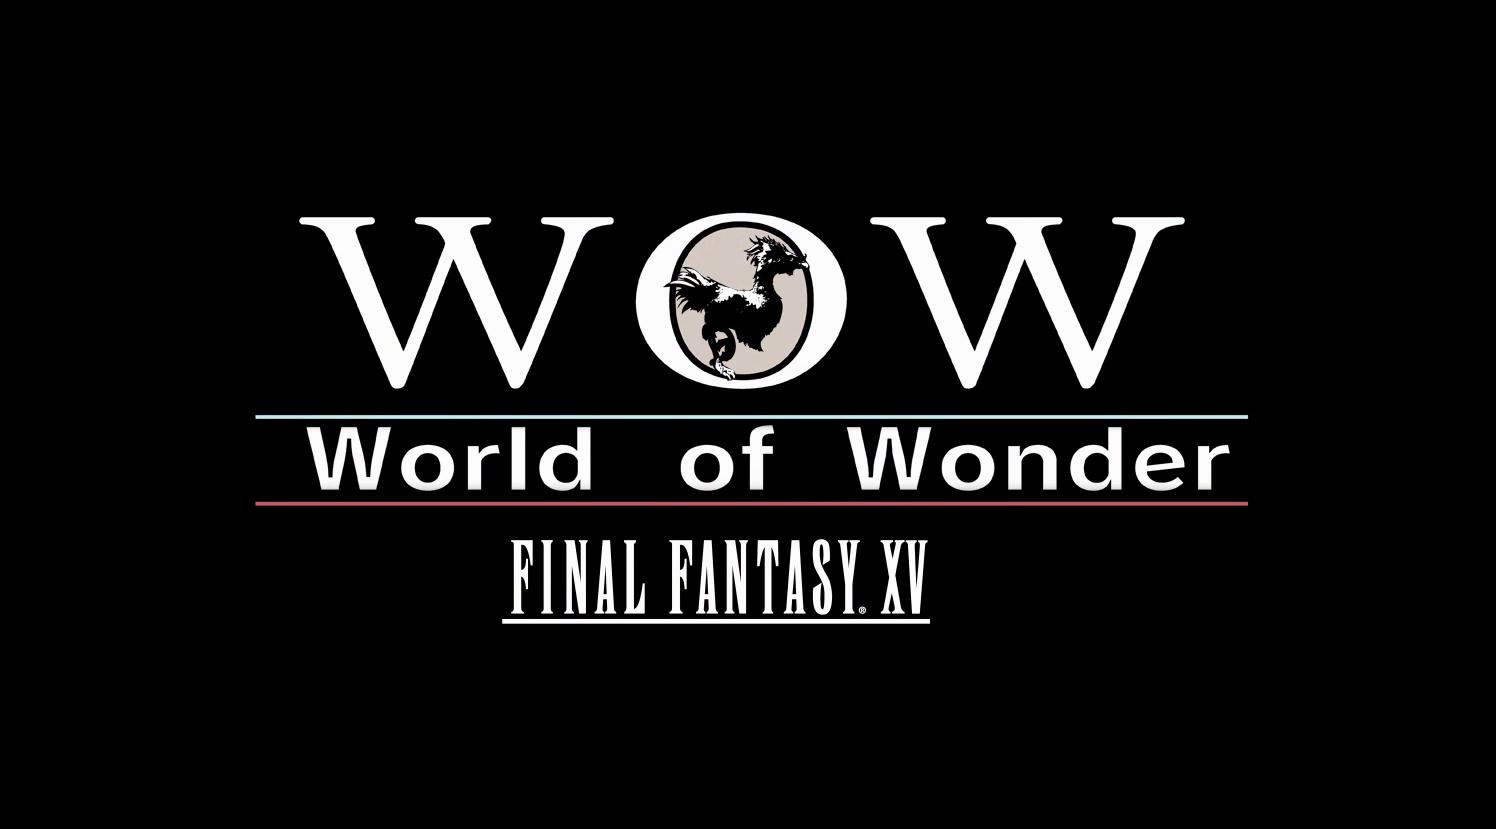 world-of-wonder-final-fantasy-xv